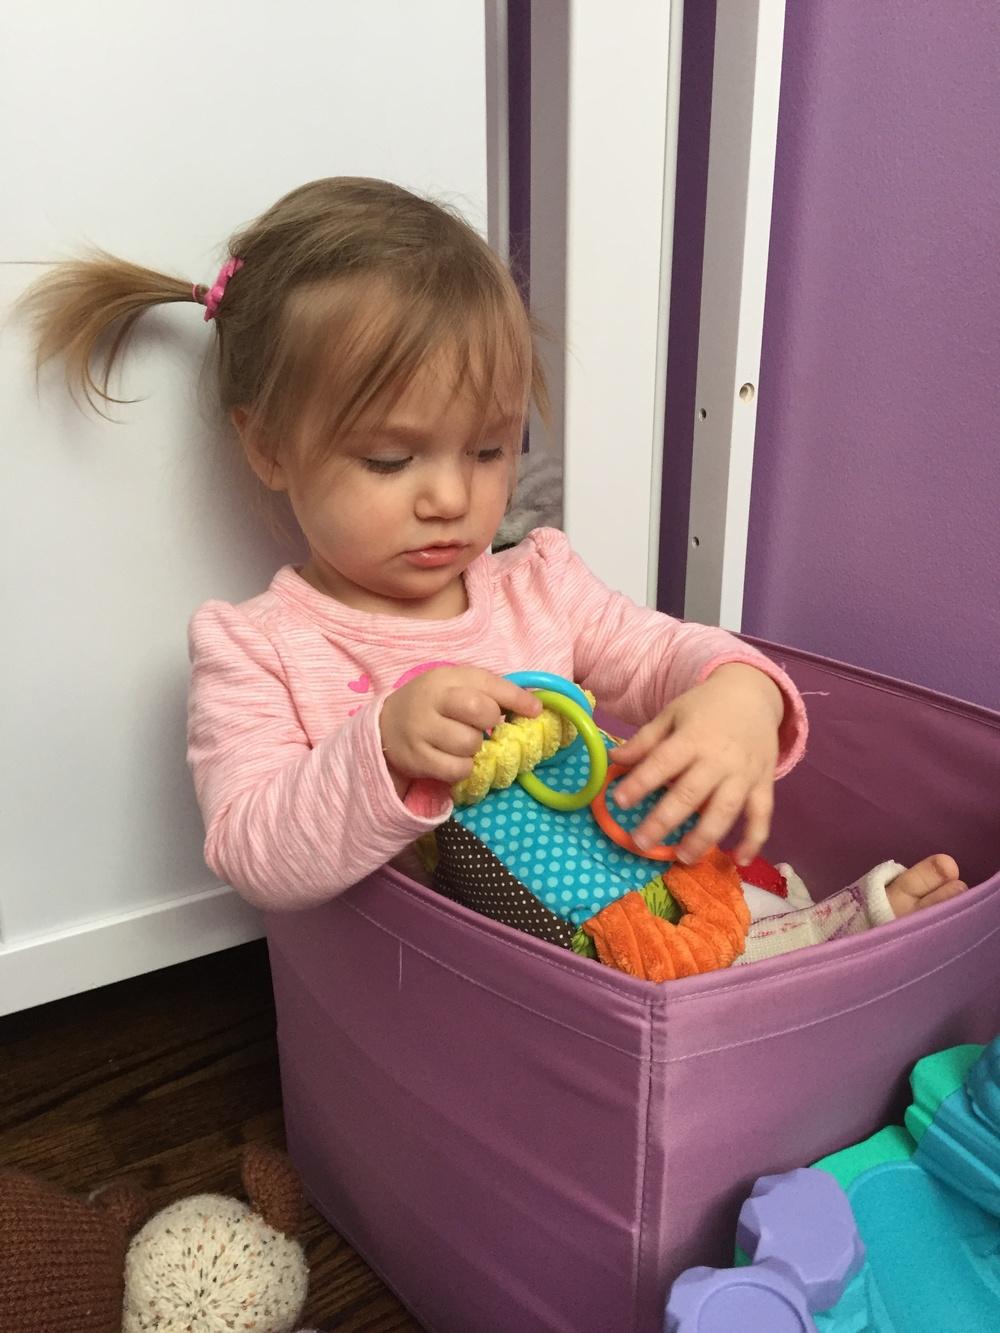 Toddler in toy bin